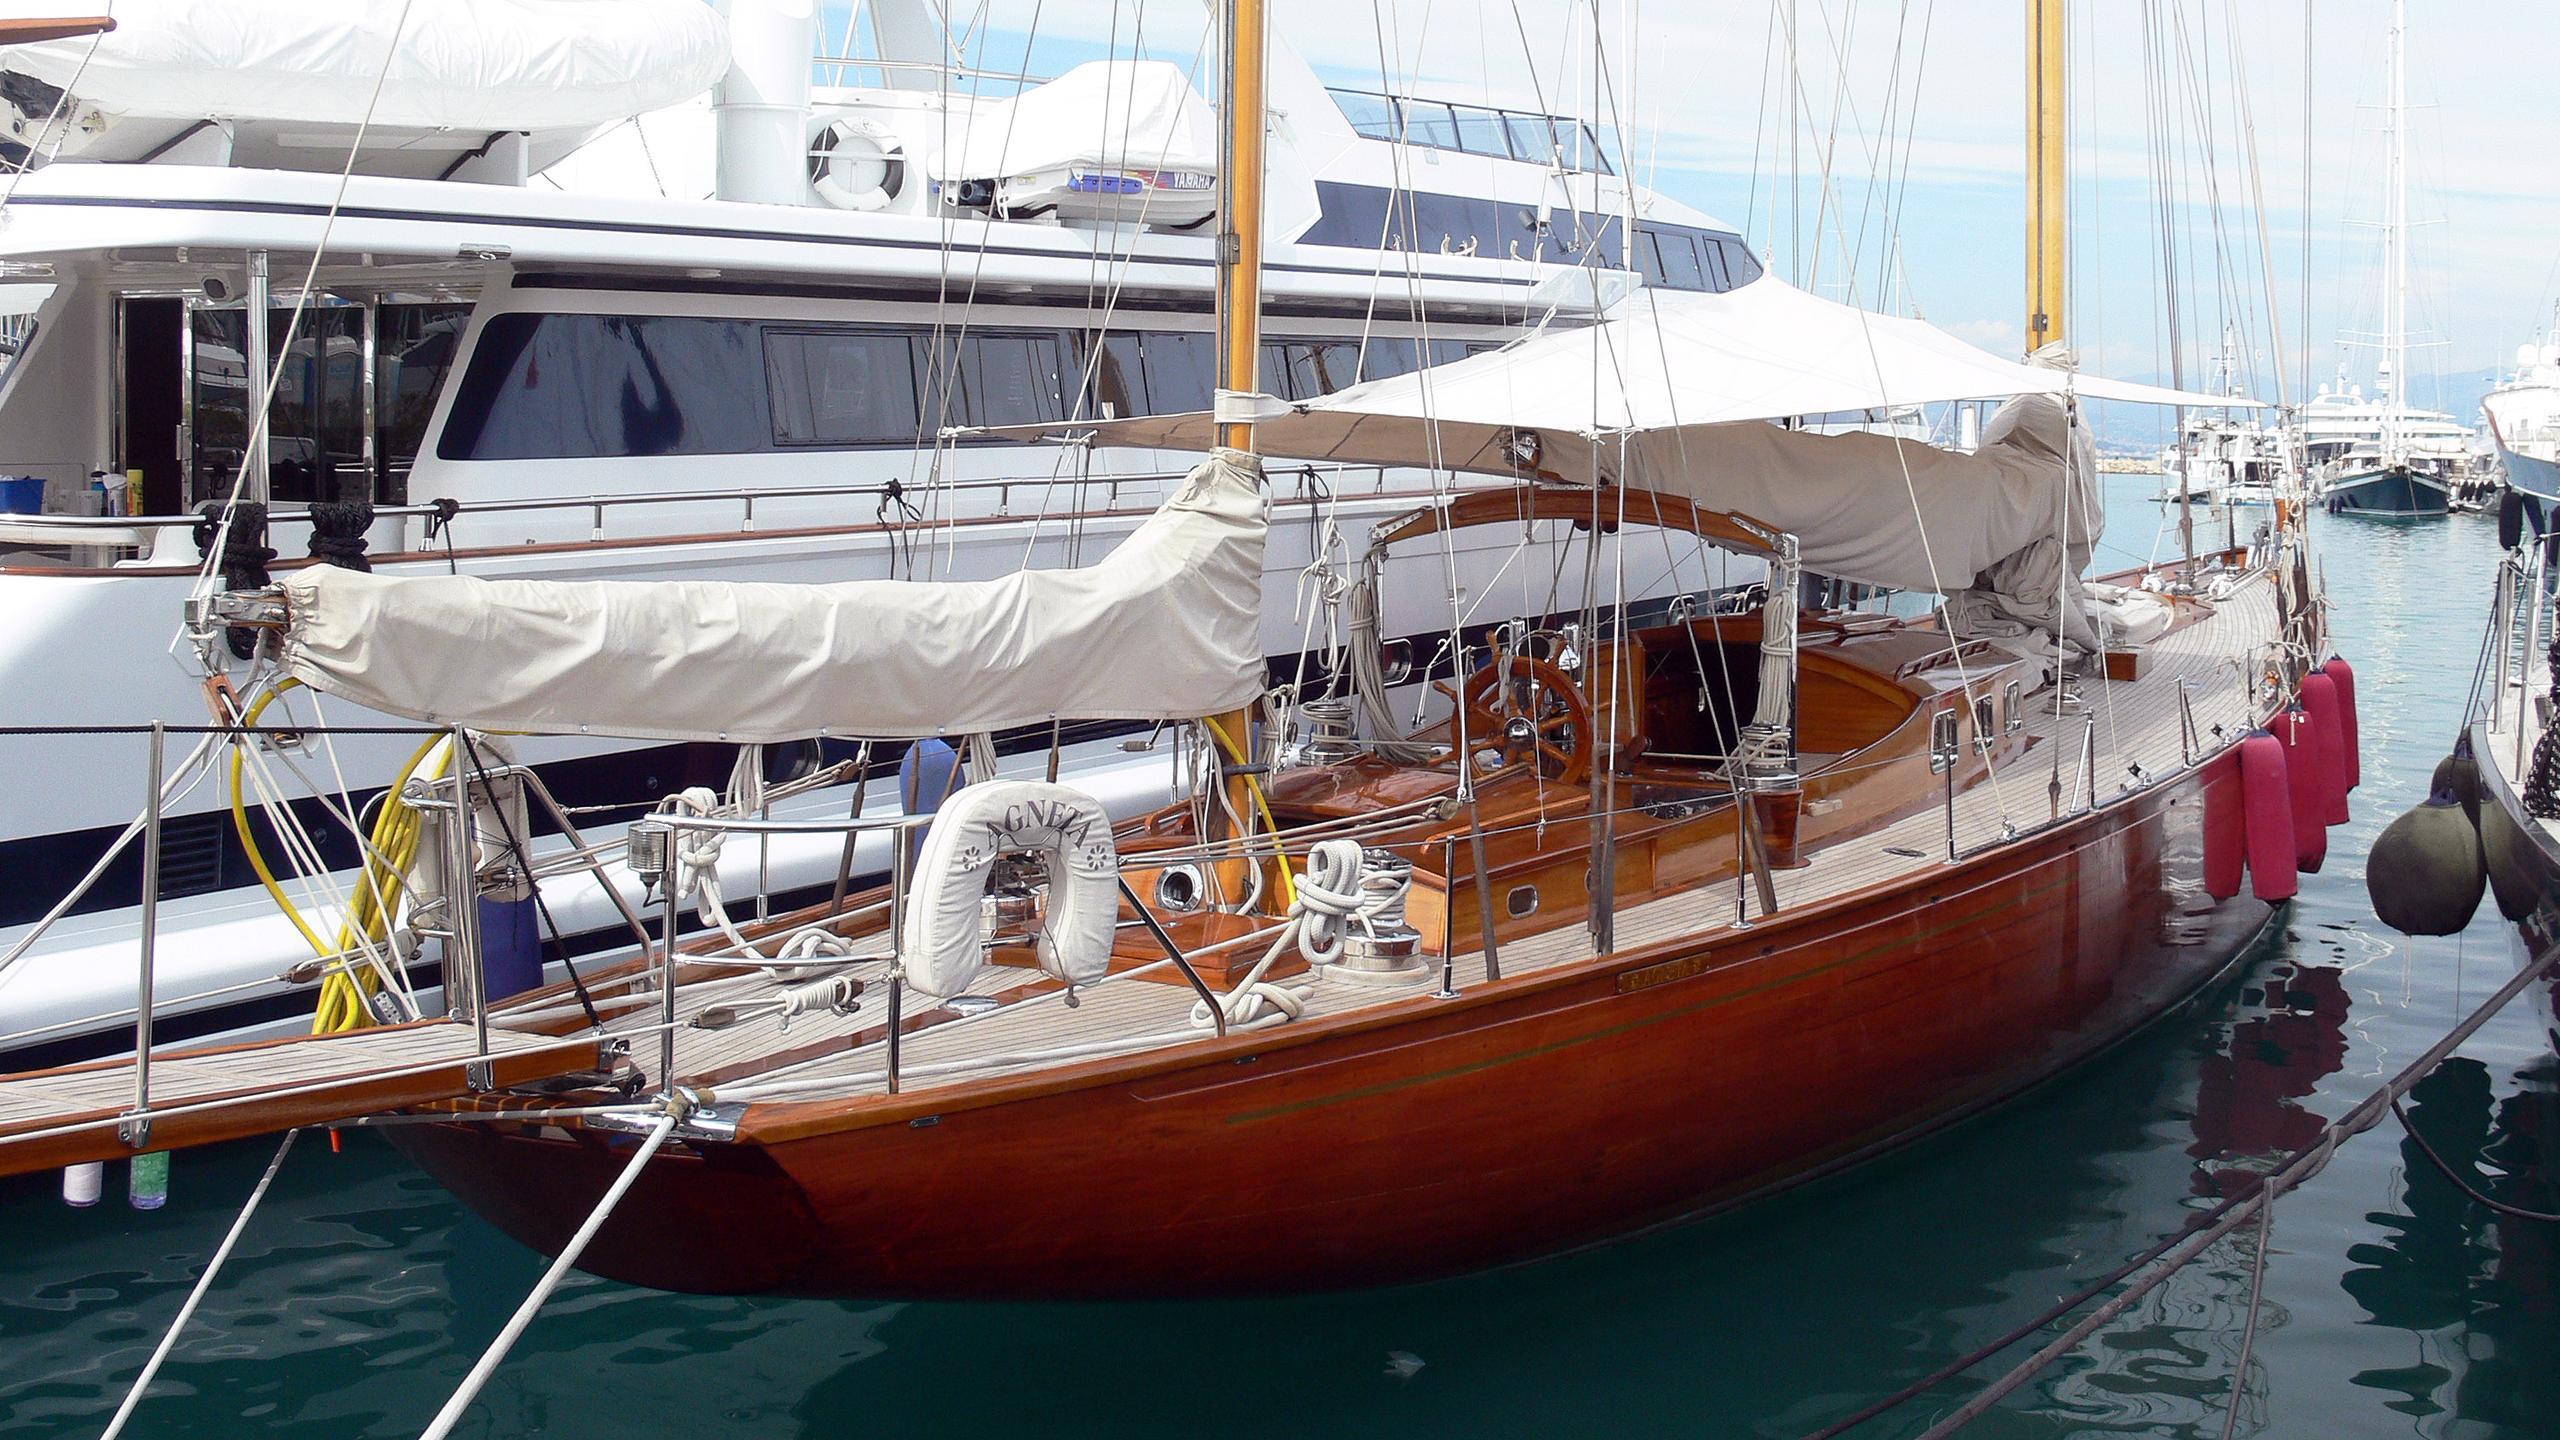 agneta-classic-sailing-yacht-plym-1951-25m-moored-stern